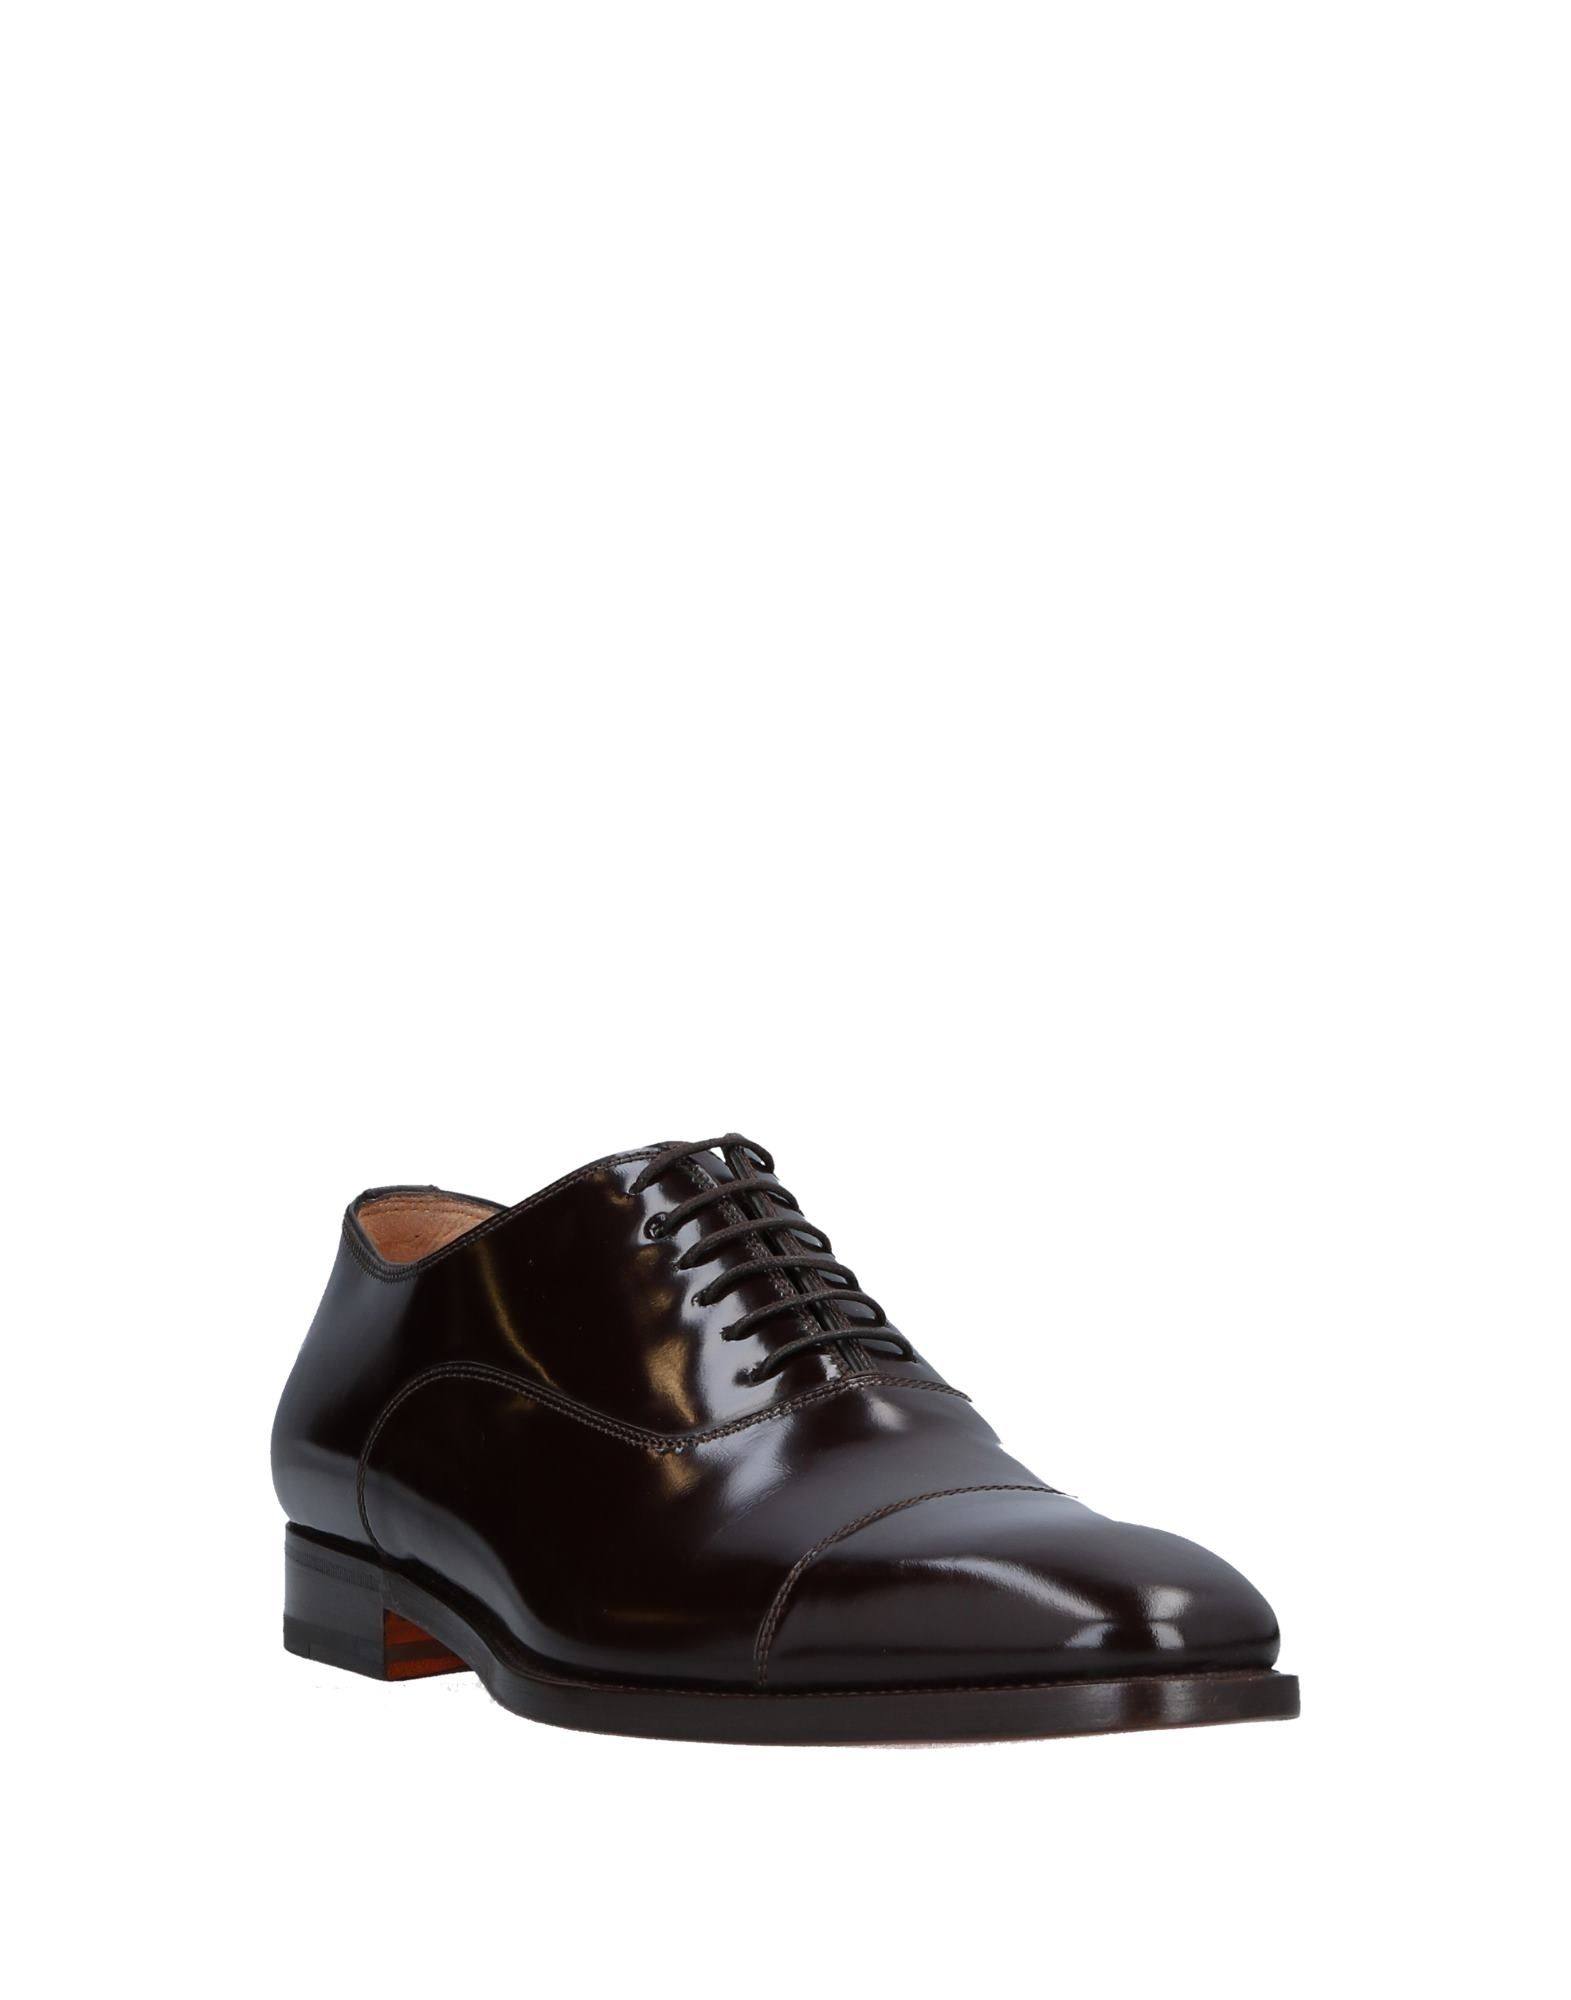 Santoni Gute Schnürschuhe Herren  11183891NS Gute Santoni Qualität beliebte Schuhe 72dca8